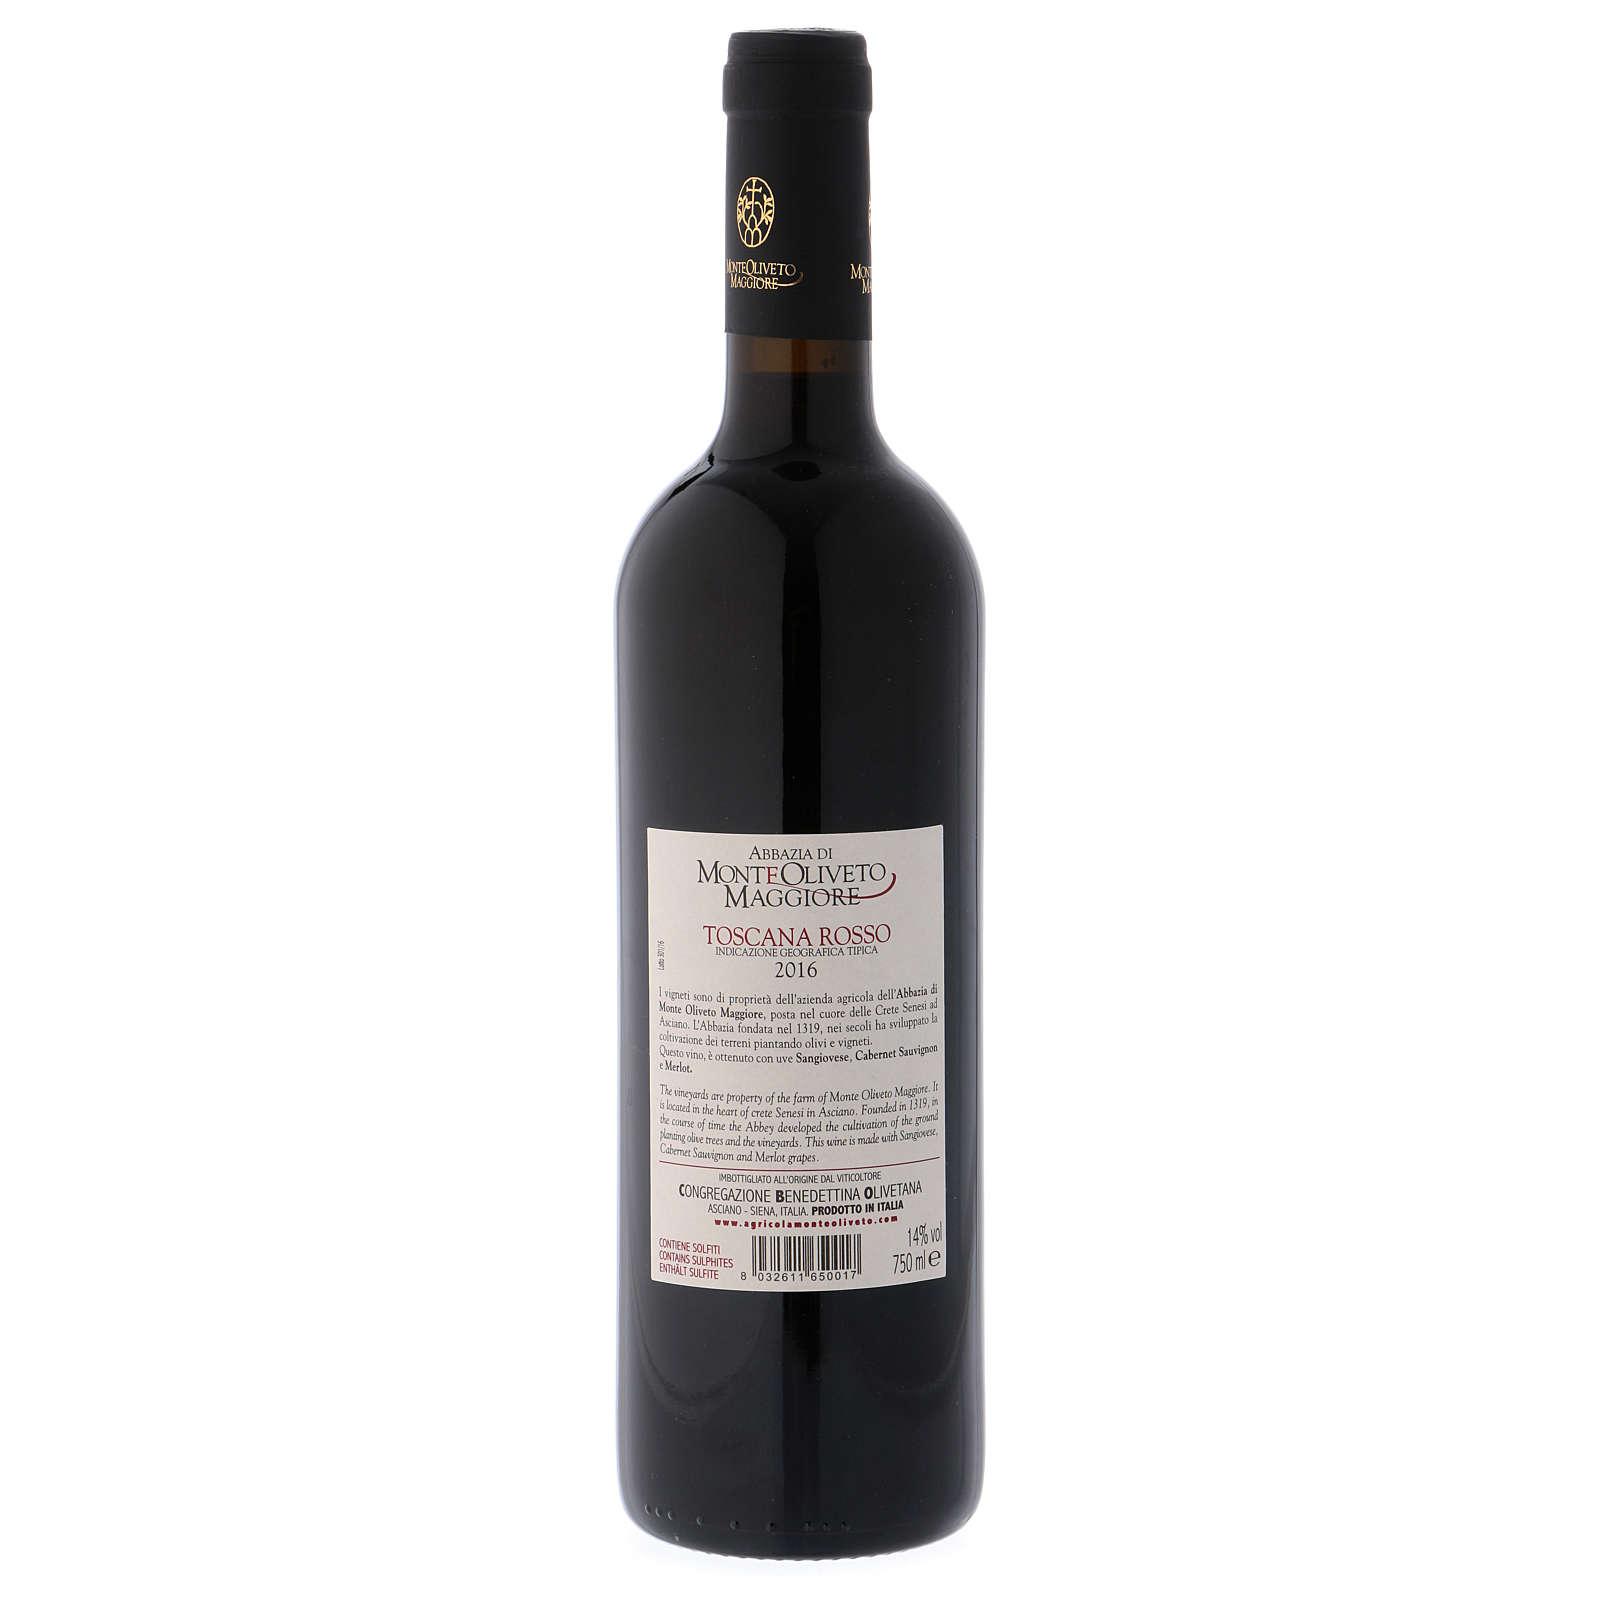 Vin de Toscane rouge 2016 Abbaye Monte Oliveto 750 ml 3